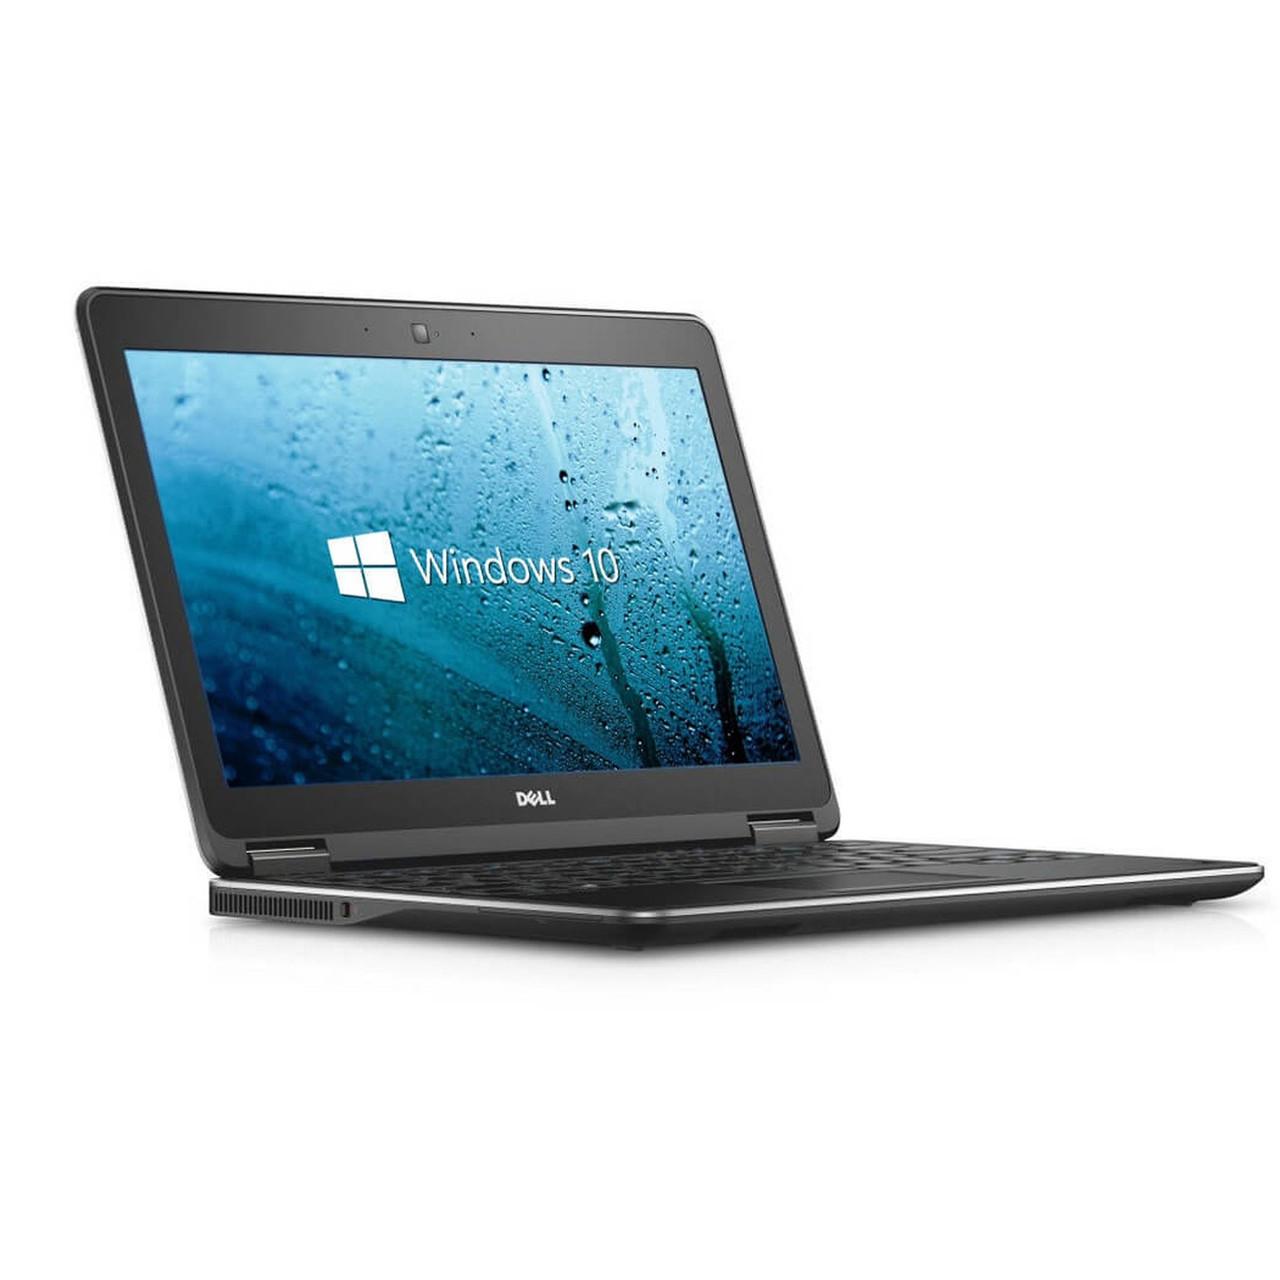 Dell Latitude E7250 Laptop Core i5 2.3GHz, 8GB Ram, 256GB SSD, Windows 10 Pro 64 Ultrabook Notebook